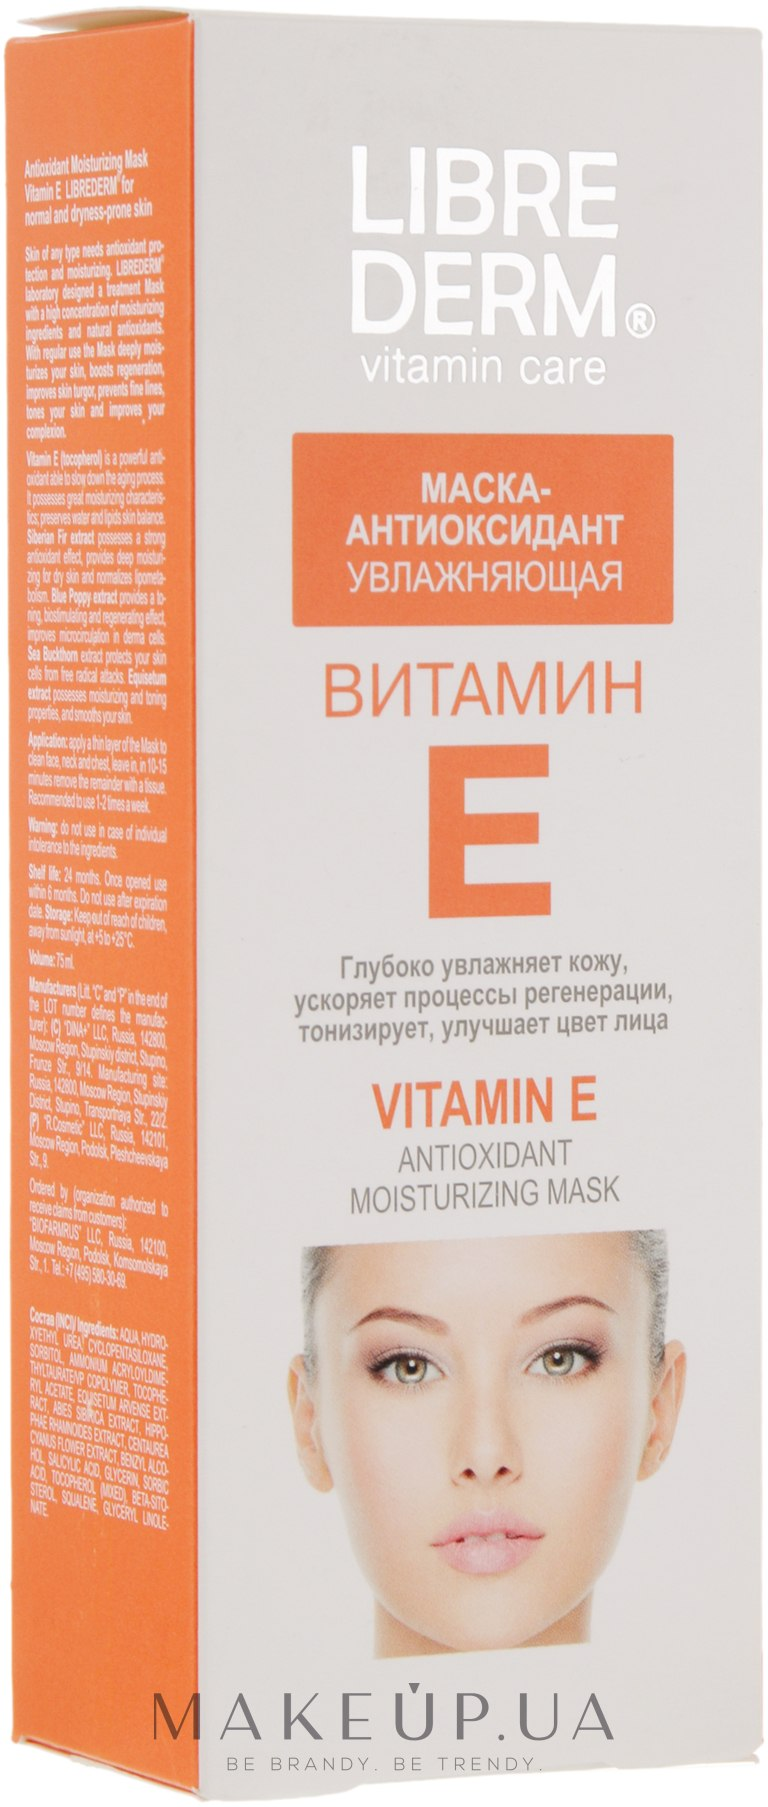 Маски с витаминами а и е для лица в домашних условиях